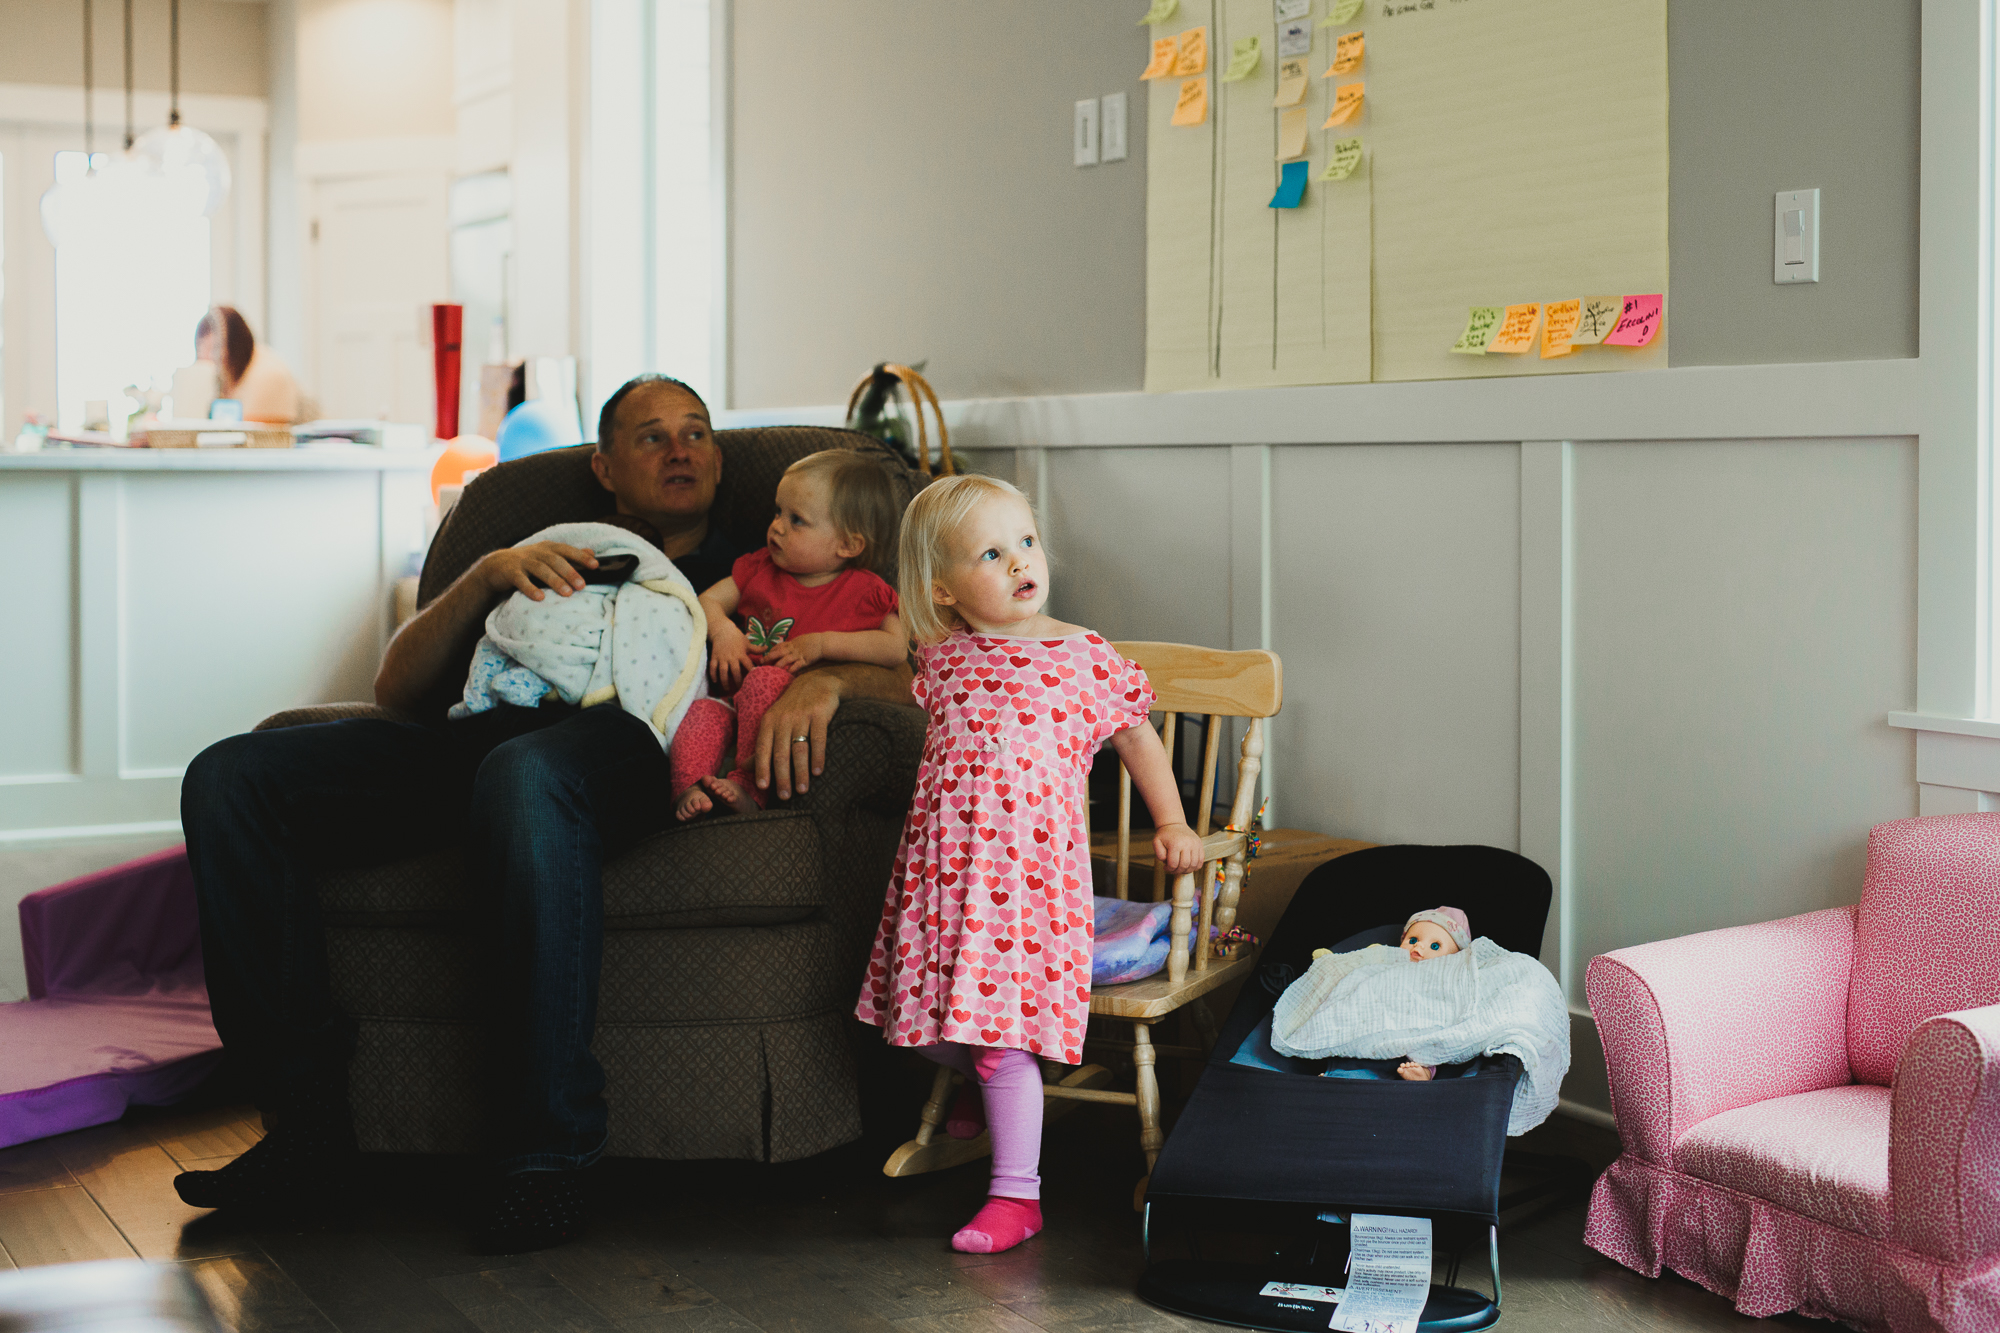 seattle newborn lifestyle family photos by Krista Welch-0001.jpg